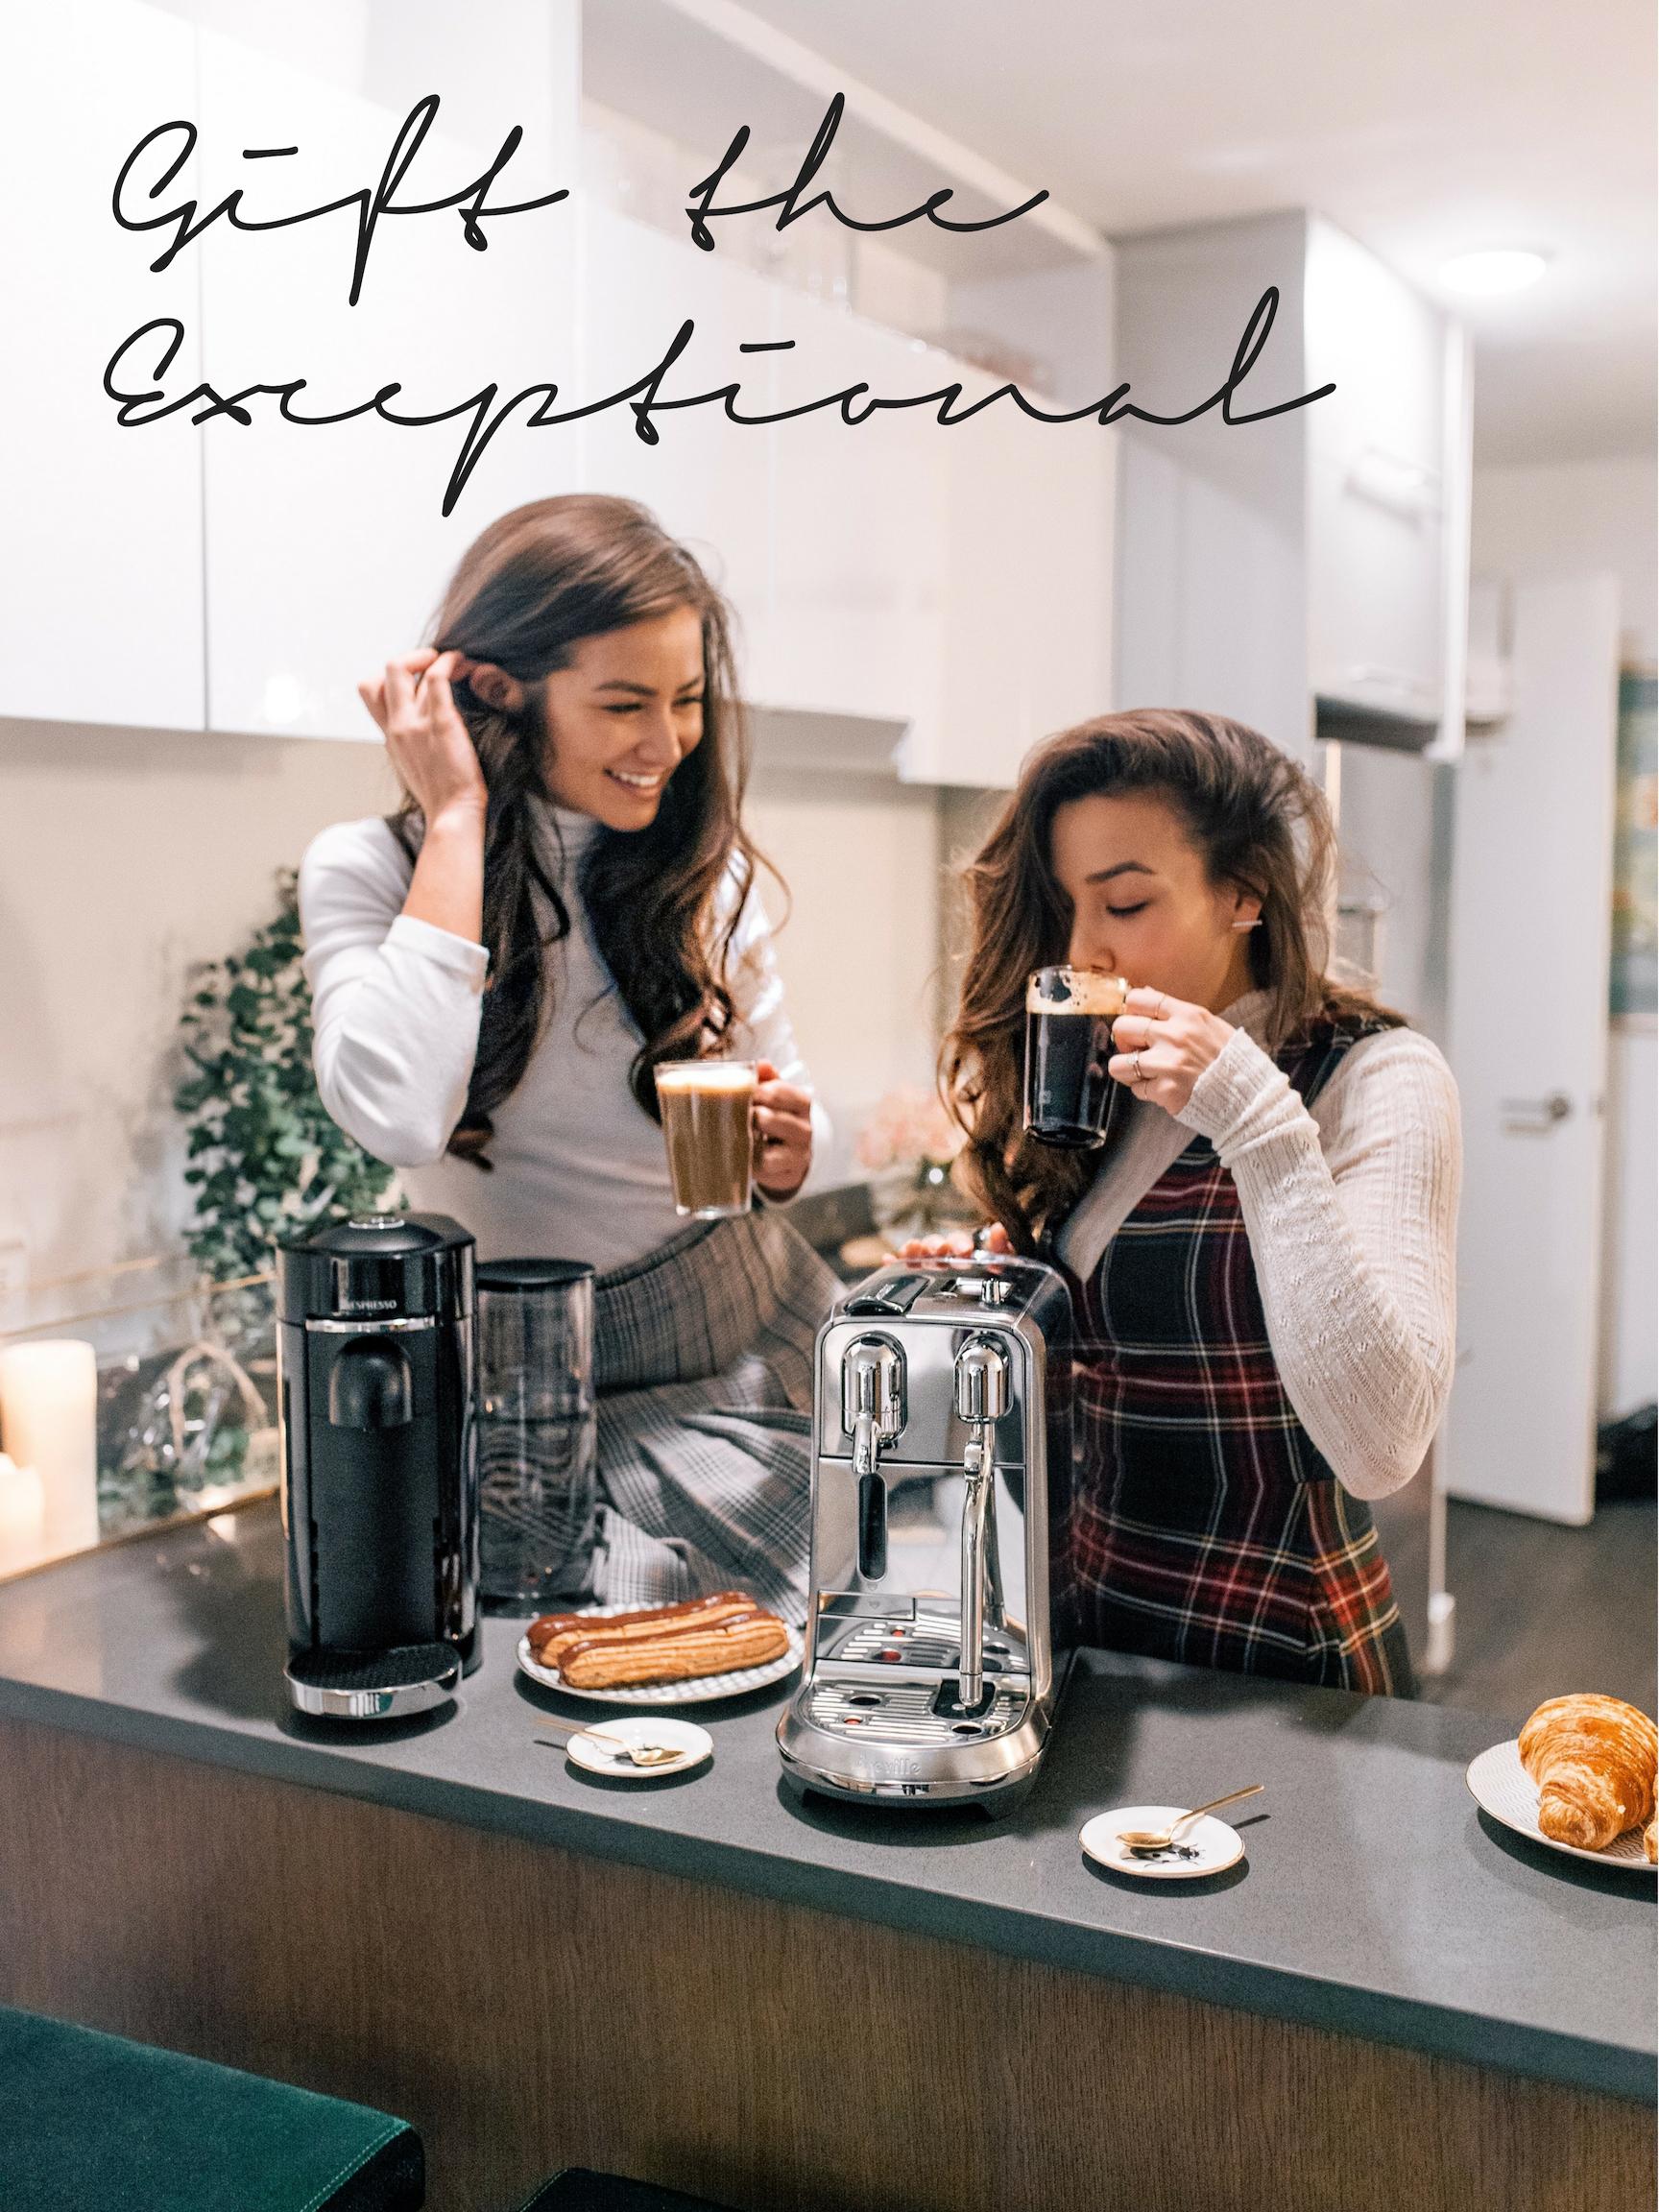 The+Bachelor+Caila+Quinn+and+Sharleen+Joynt+enjoying+Nespresso+Coffee+Machine+a+premium+holiday+gift+in+their+New+York+City+Kitchen.jpg